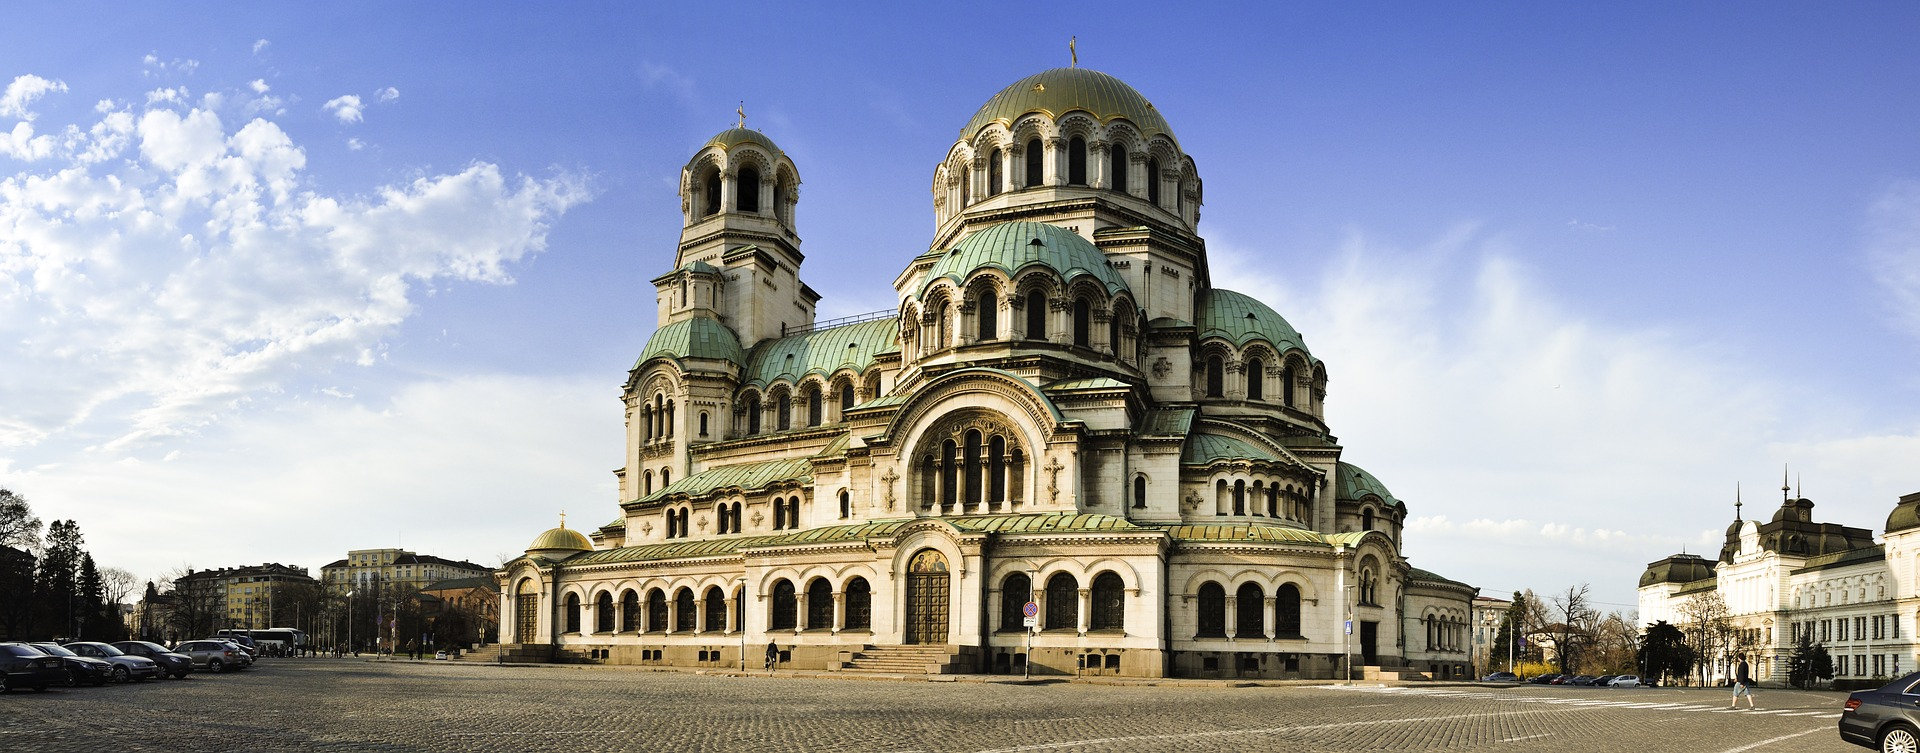 Sofia | DigiNo | 10 Best Locations For Digital Nomads